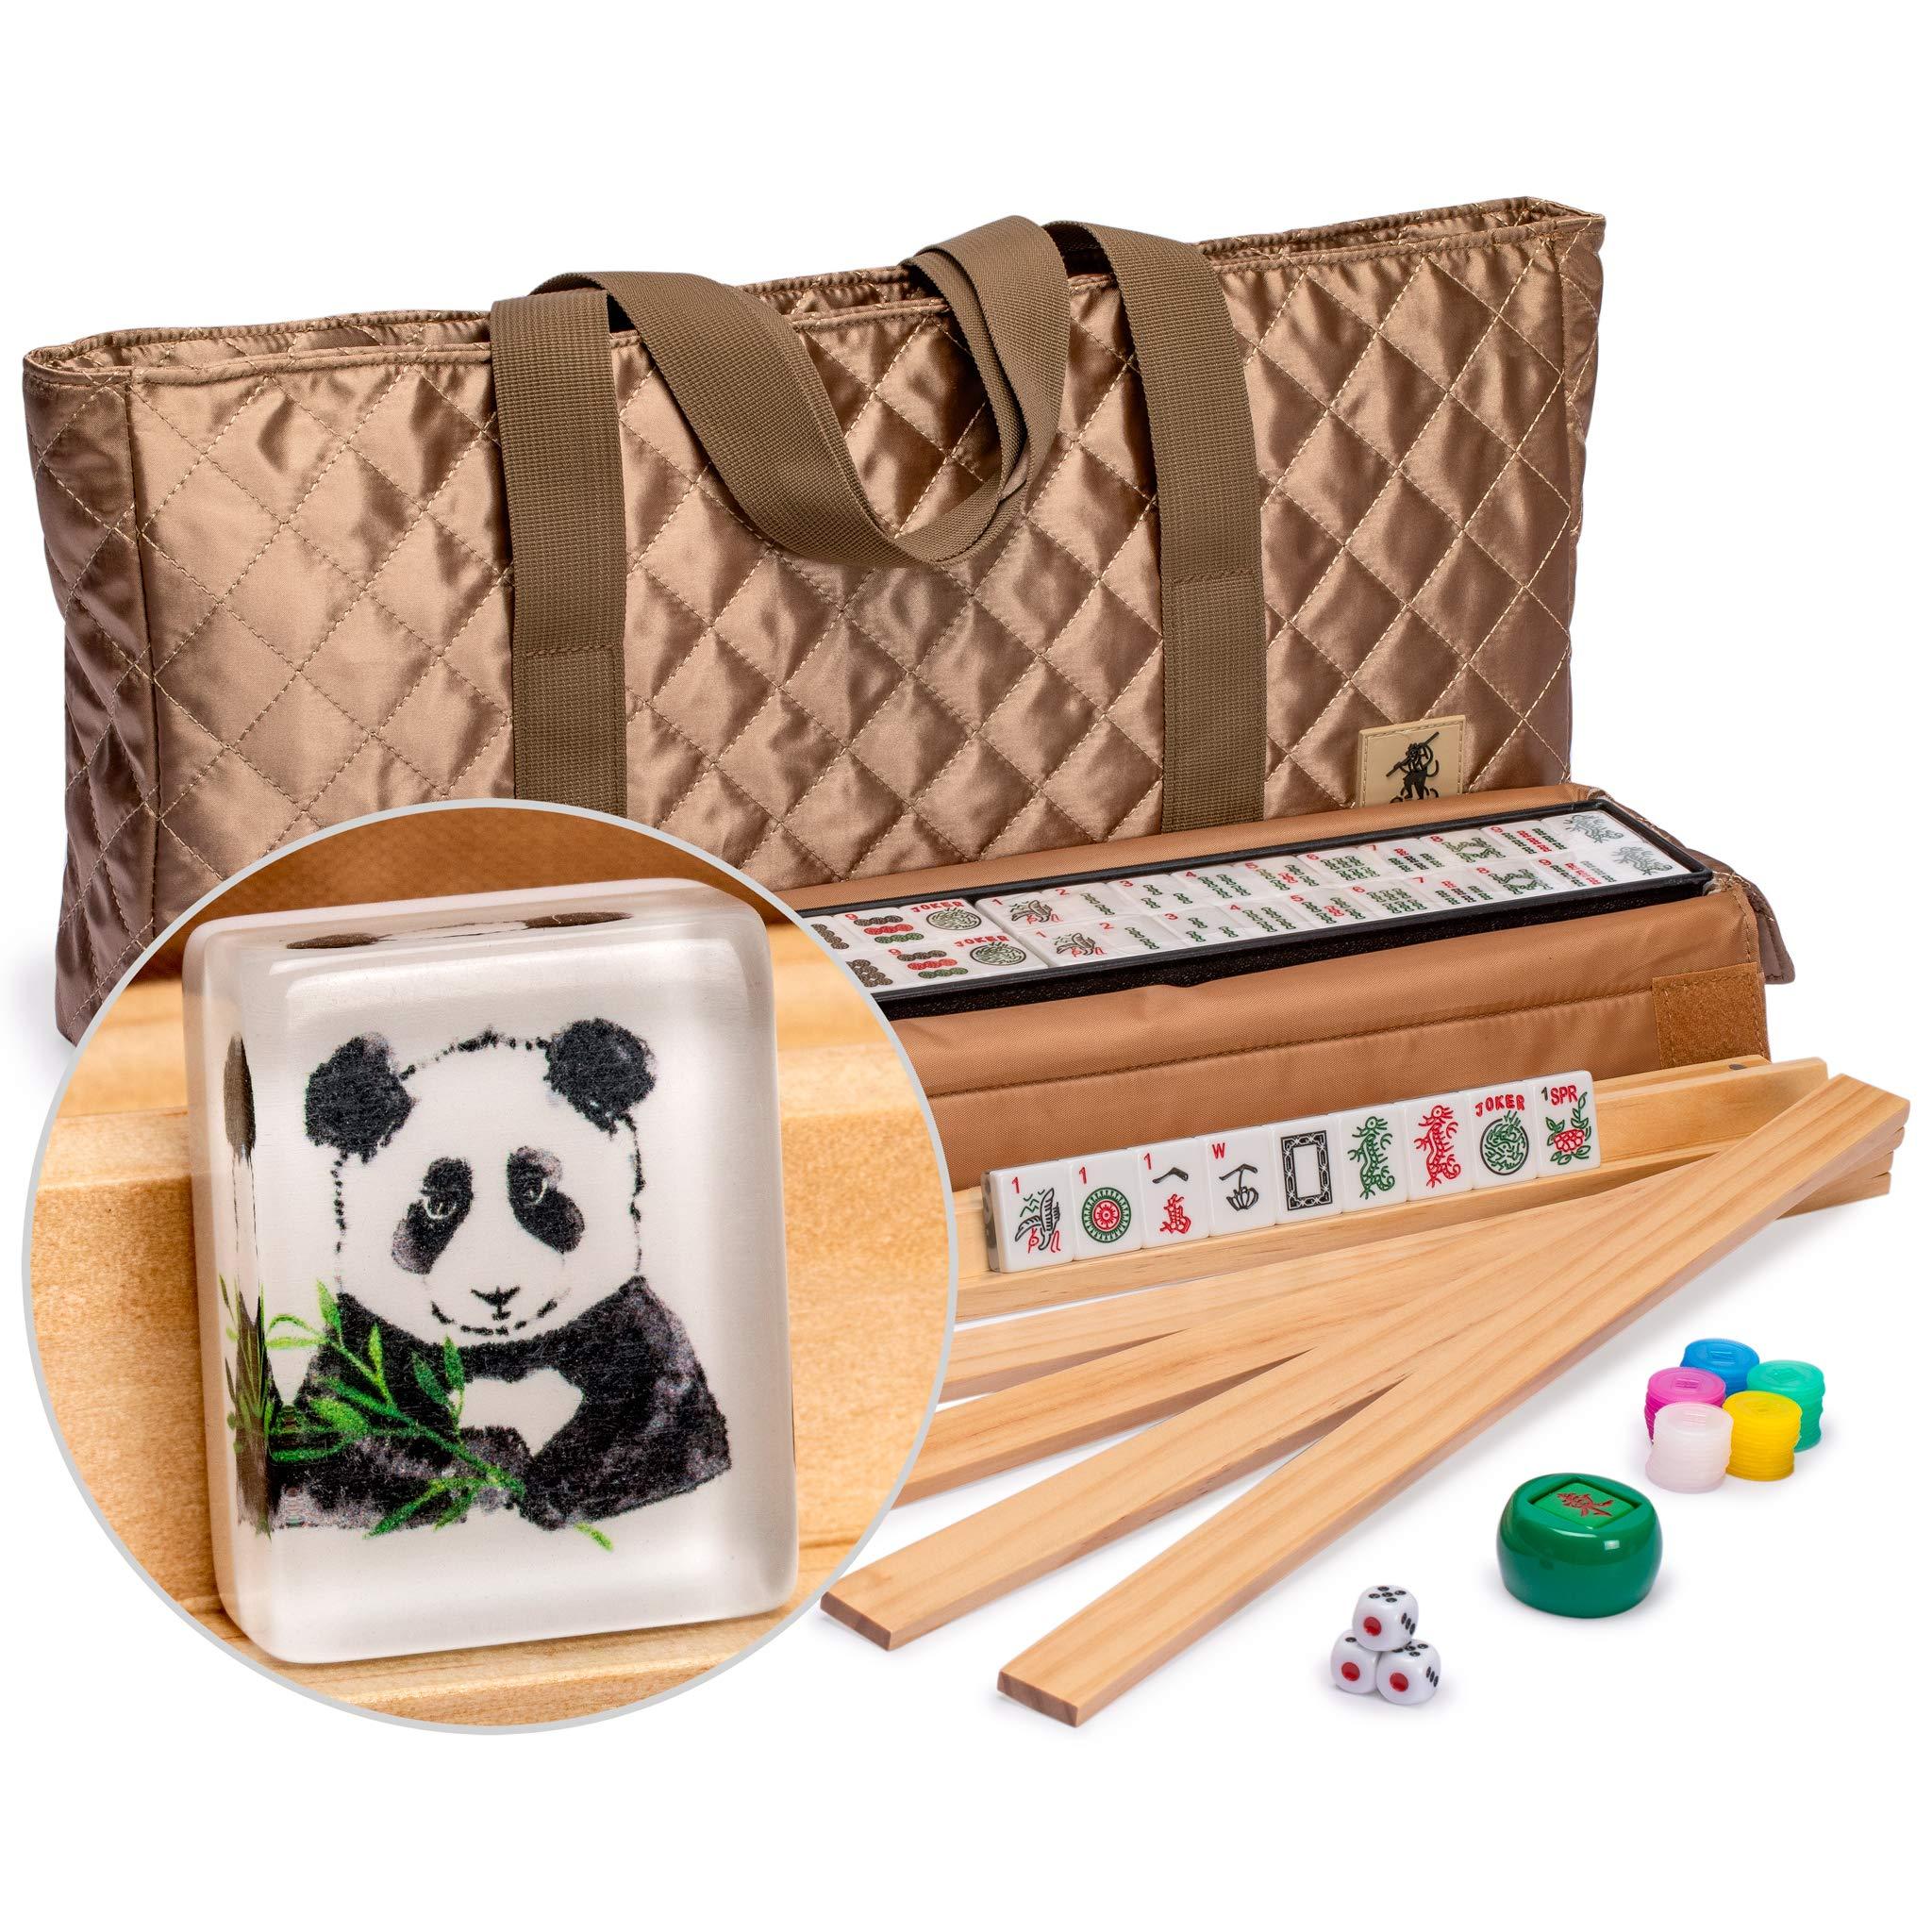 American Mahjong Set Leather Case ''Panda'' w/ All-in-One Rack/Pushers